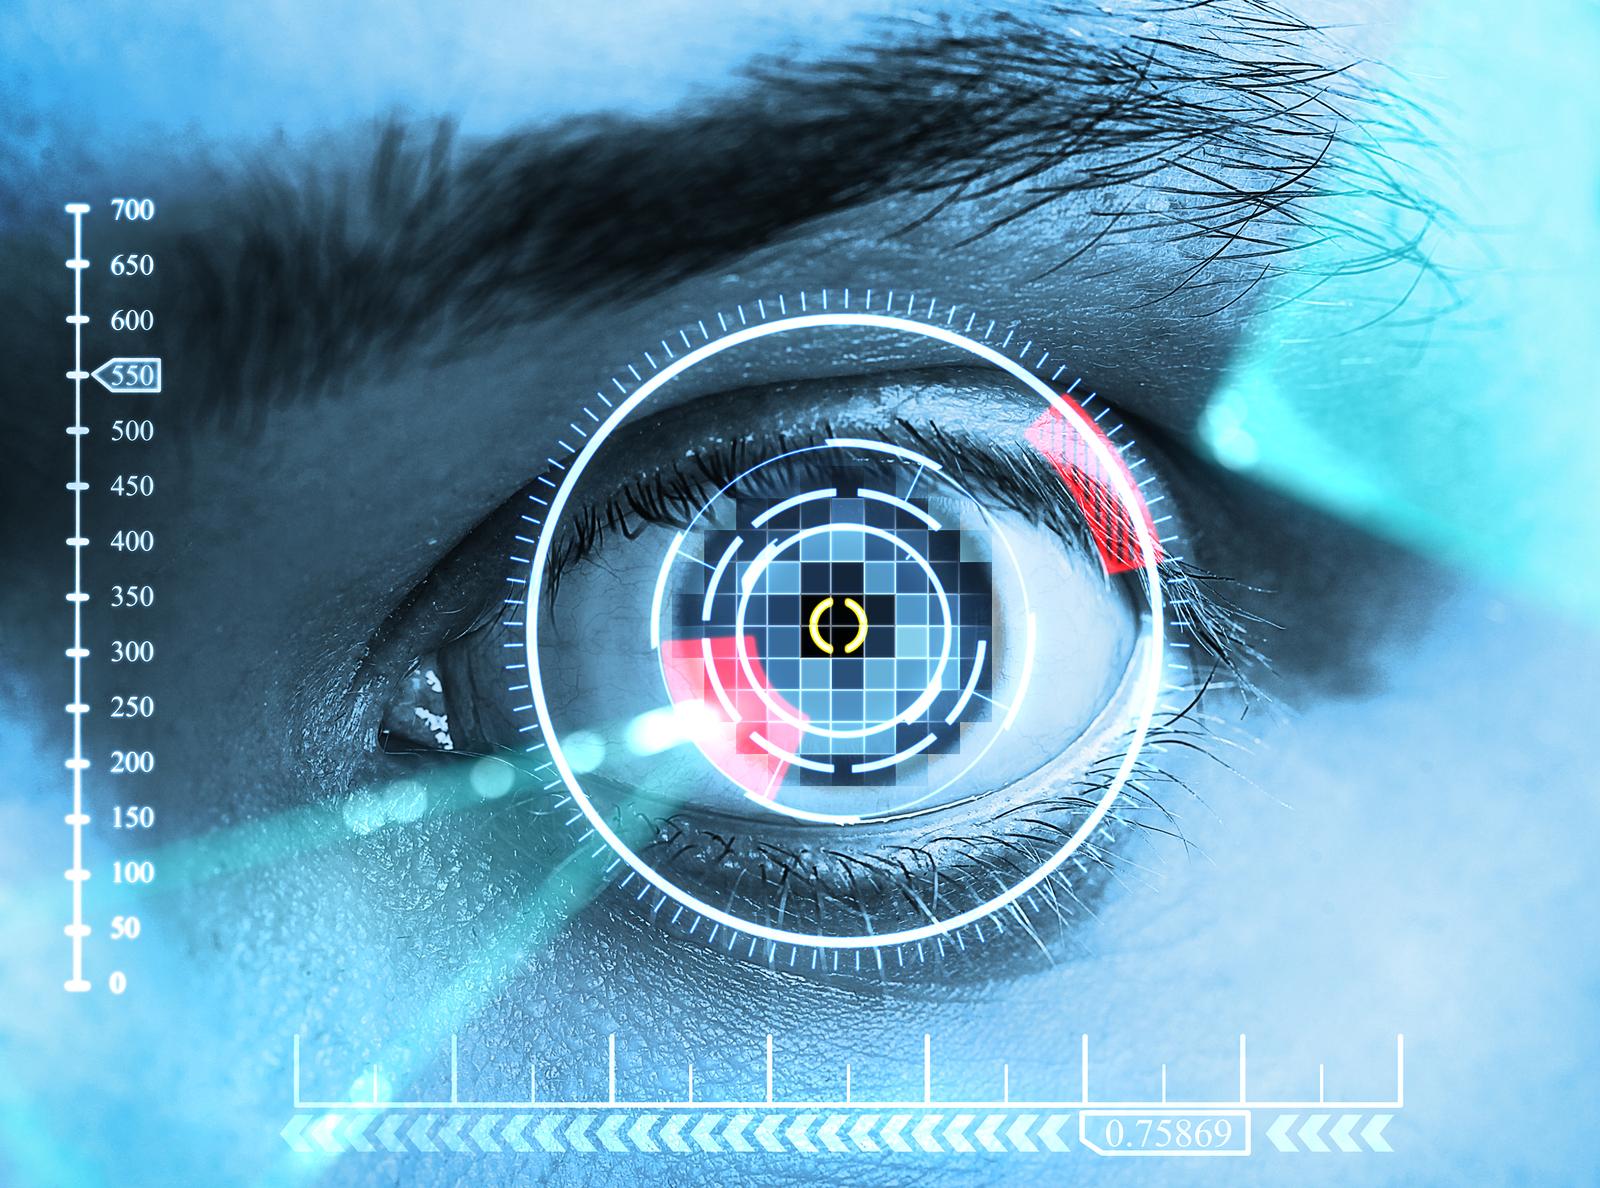 laser scanning eye. blue tone, close up